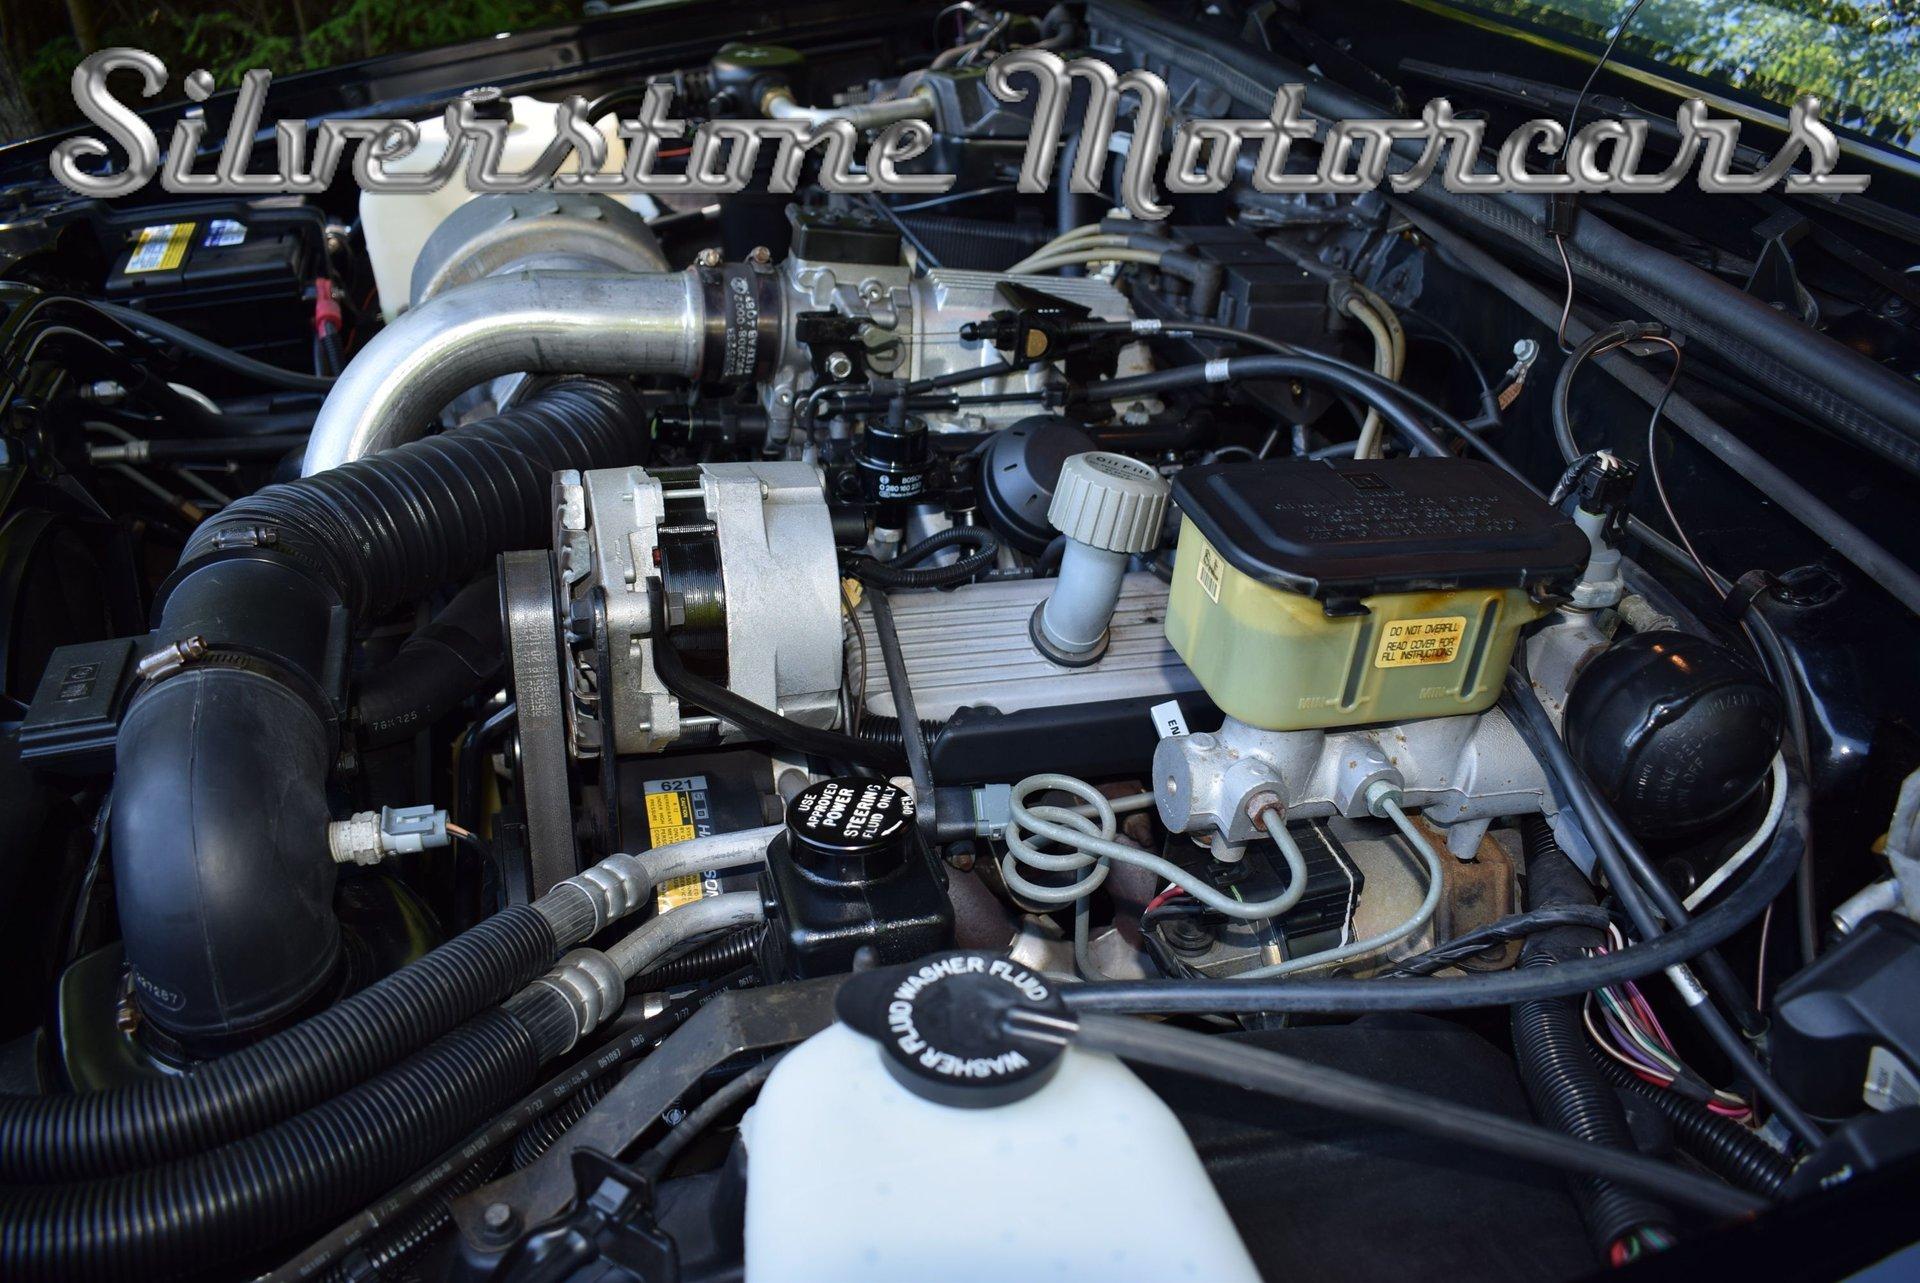 1987 Buick Grand National | Silverstone Motorcars